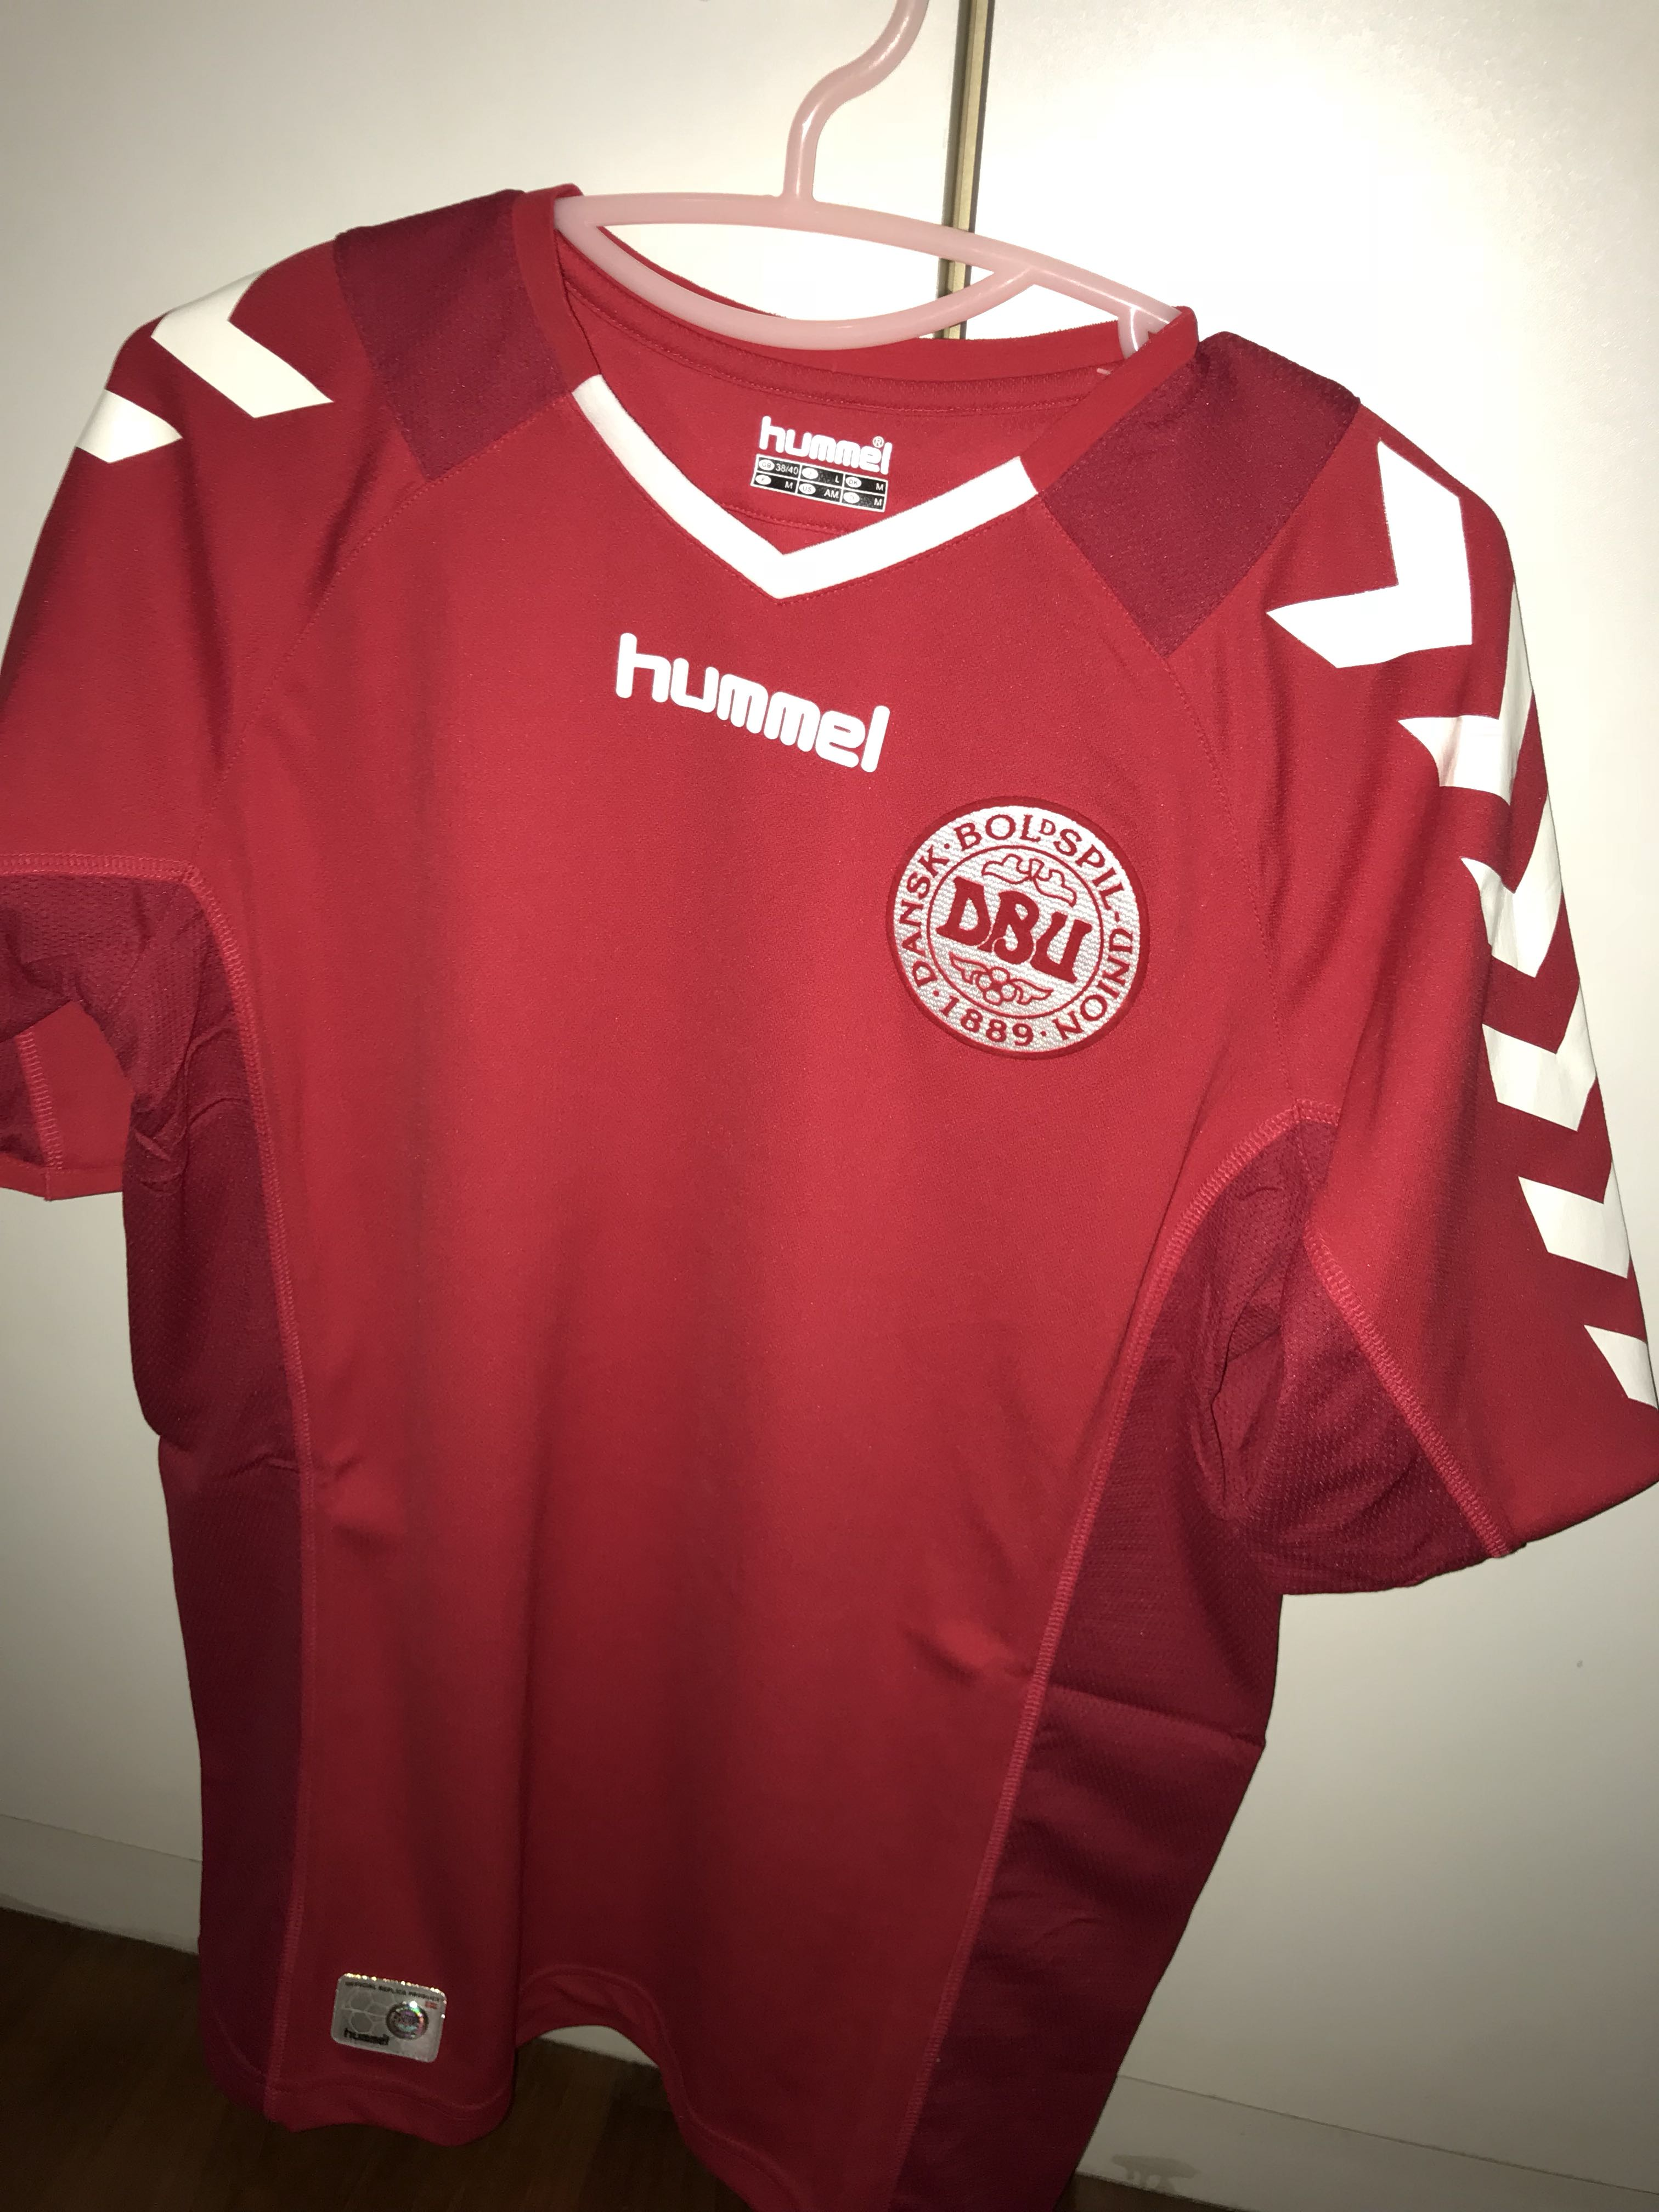 284c69b7d Denmark Authentic Football Jersey (Hummel)